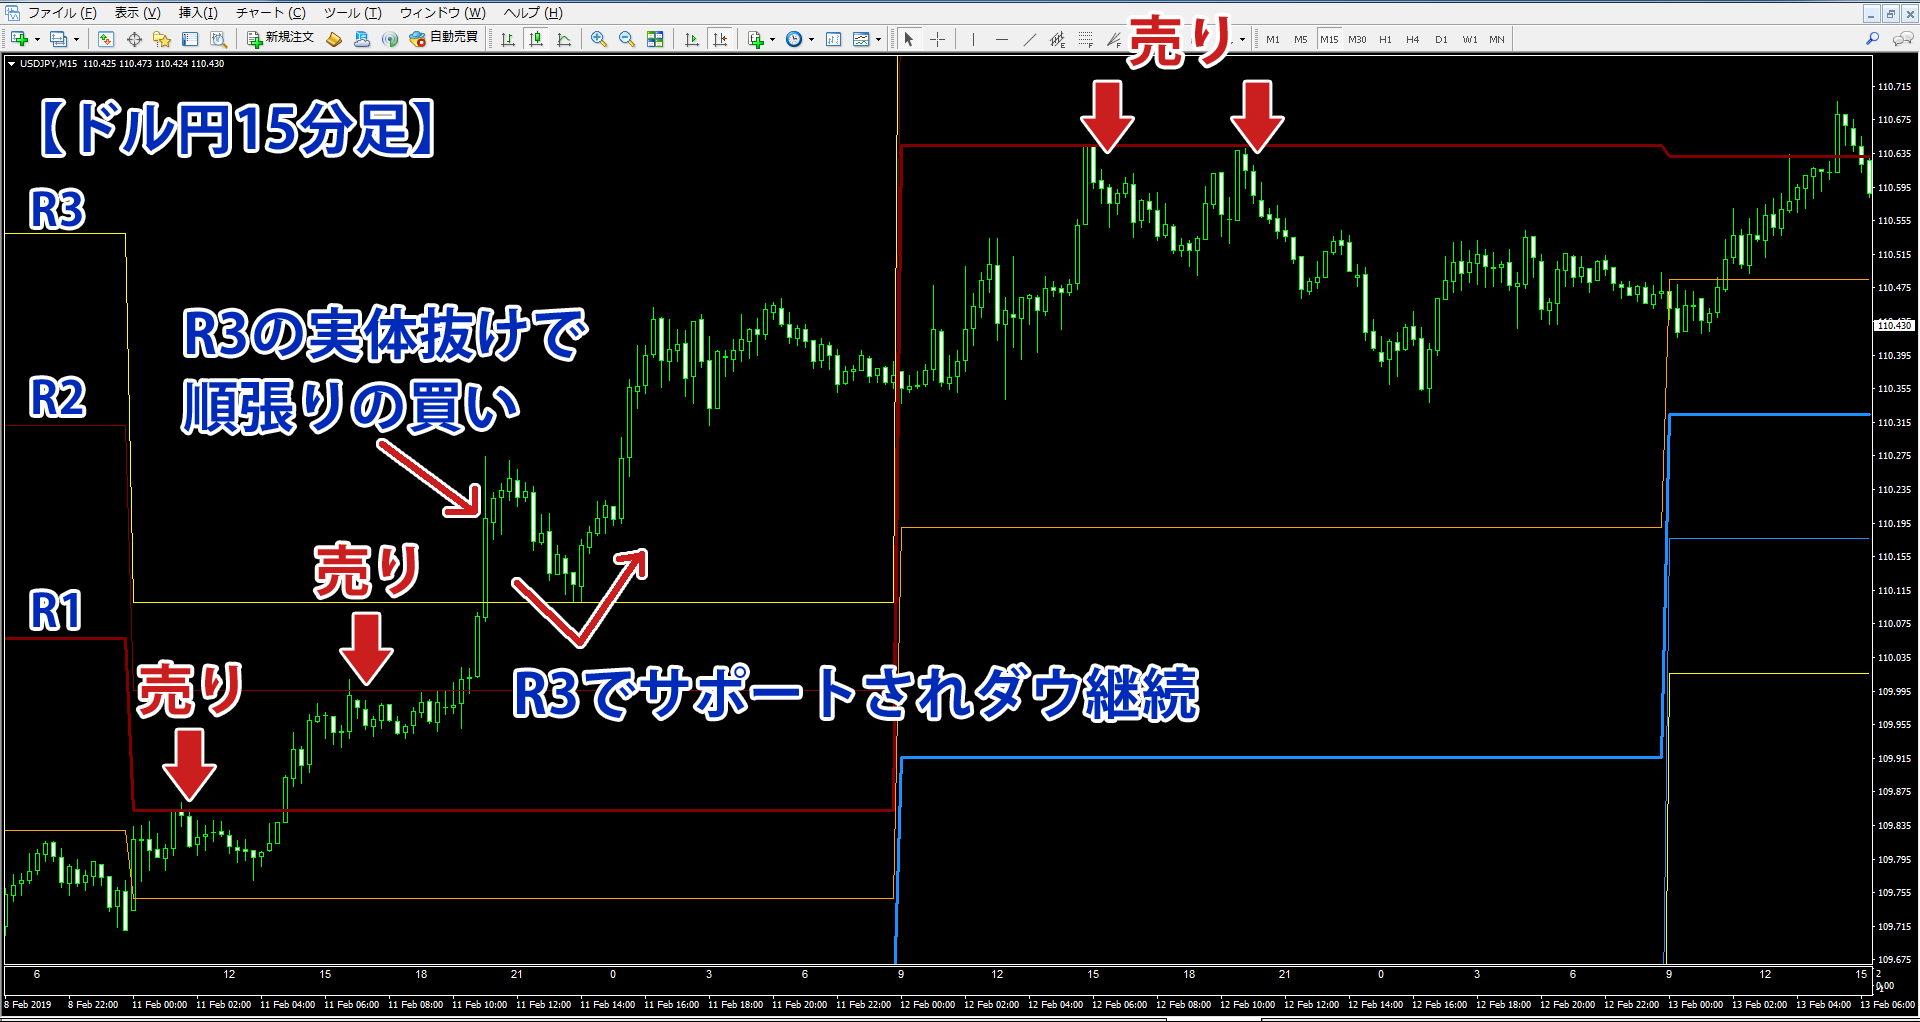 R1・R2で逆張りエントリーしたドル円15分足チャート